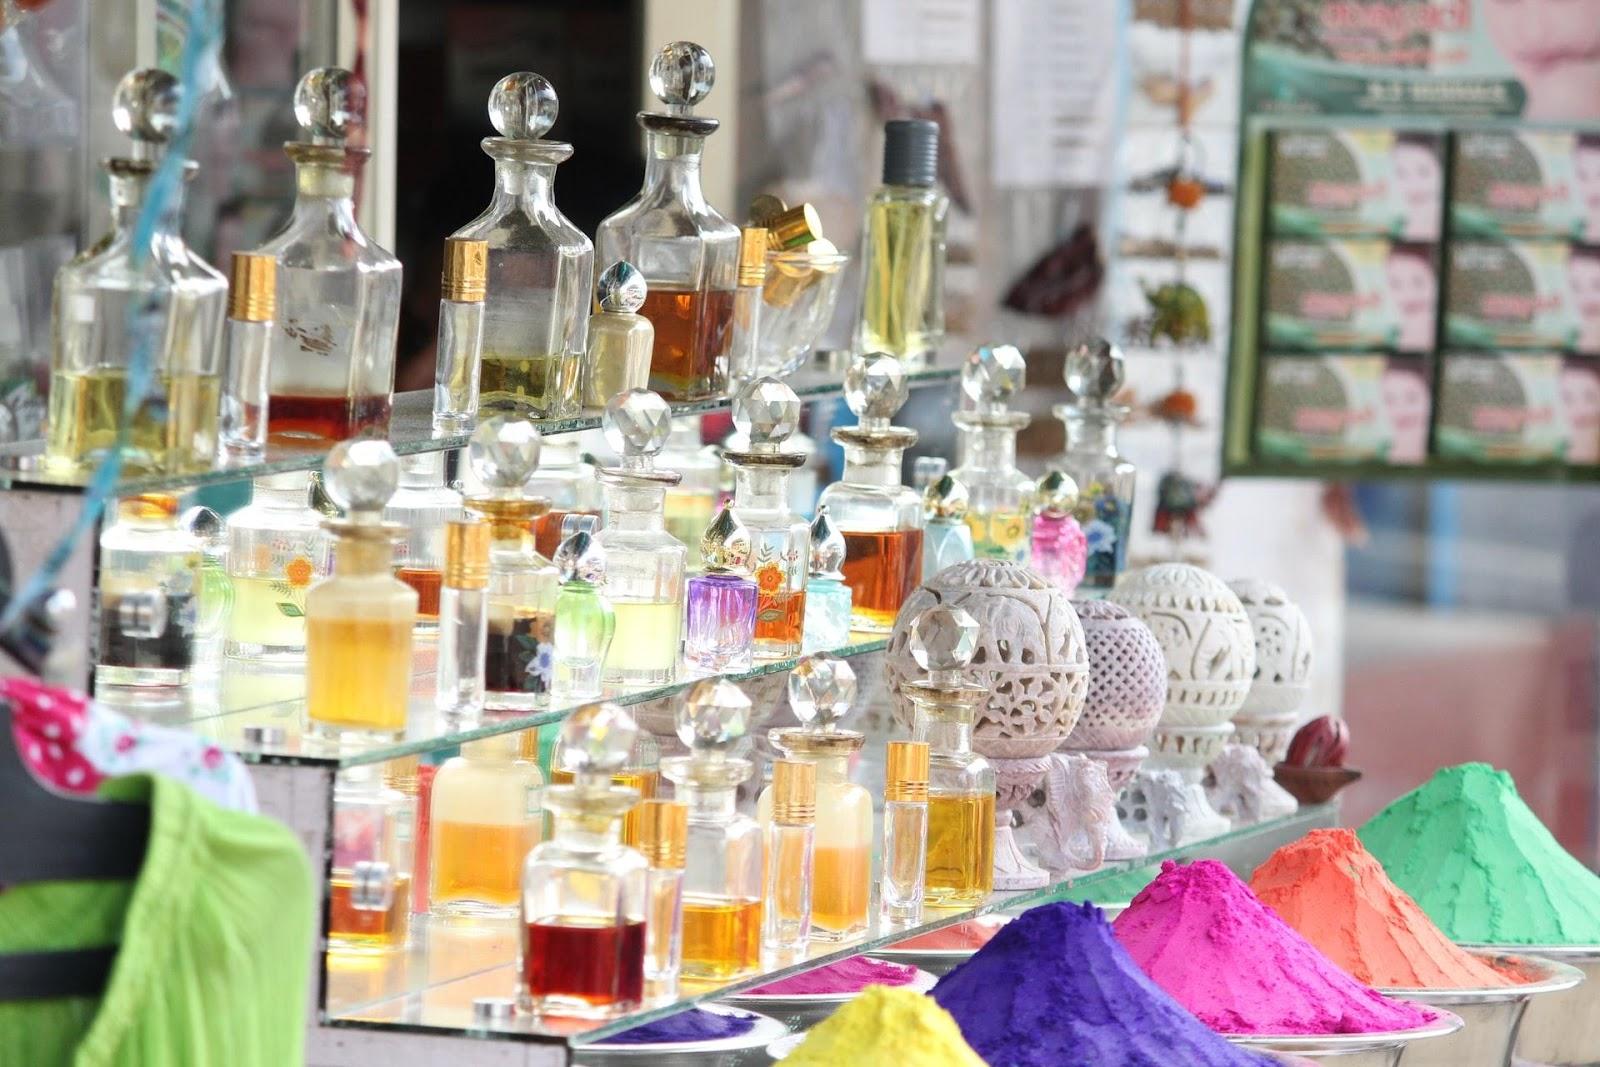 Ingredients For A Romantic Perfume.jpg